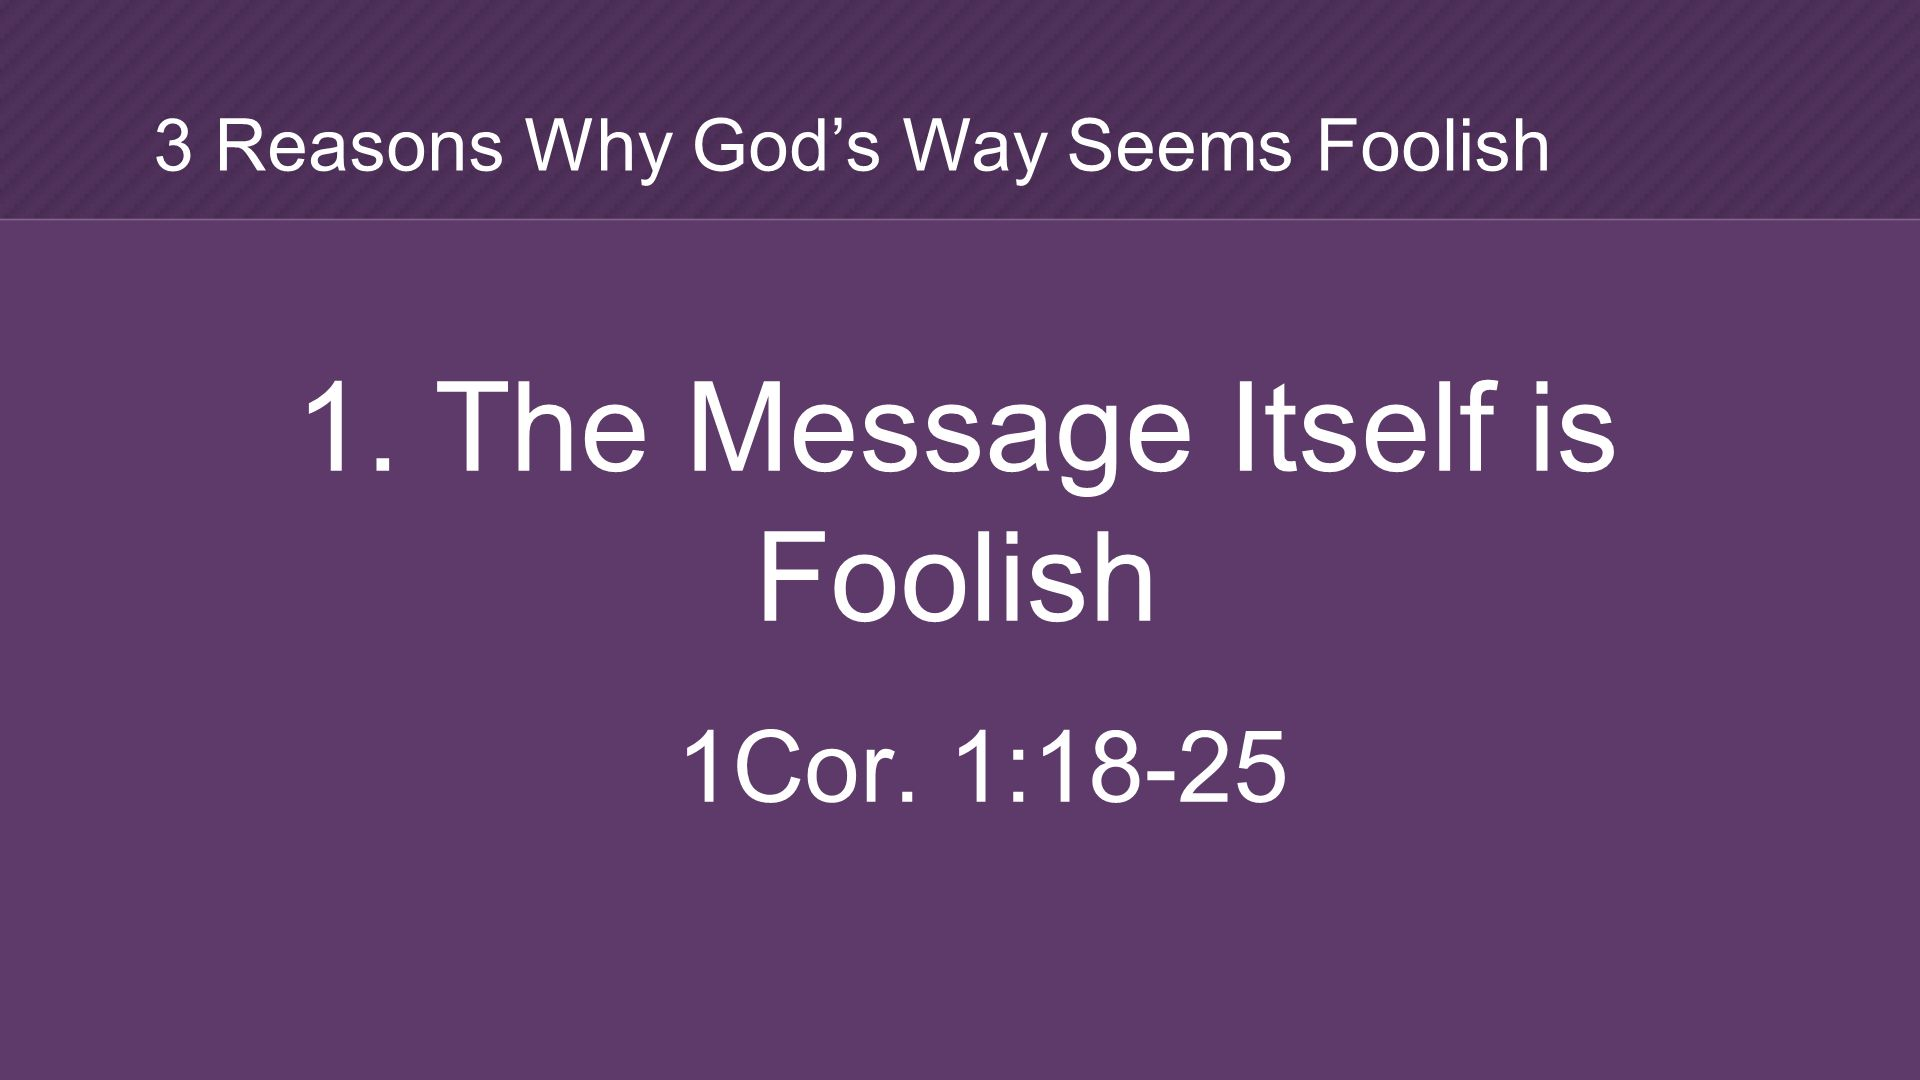 1. The Message Itself is Foolish 1Cor. 1:18-25 3 Reasons Why God's Way Seems Foolish